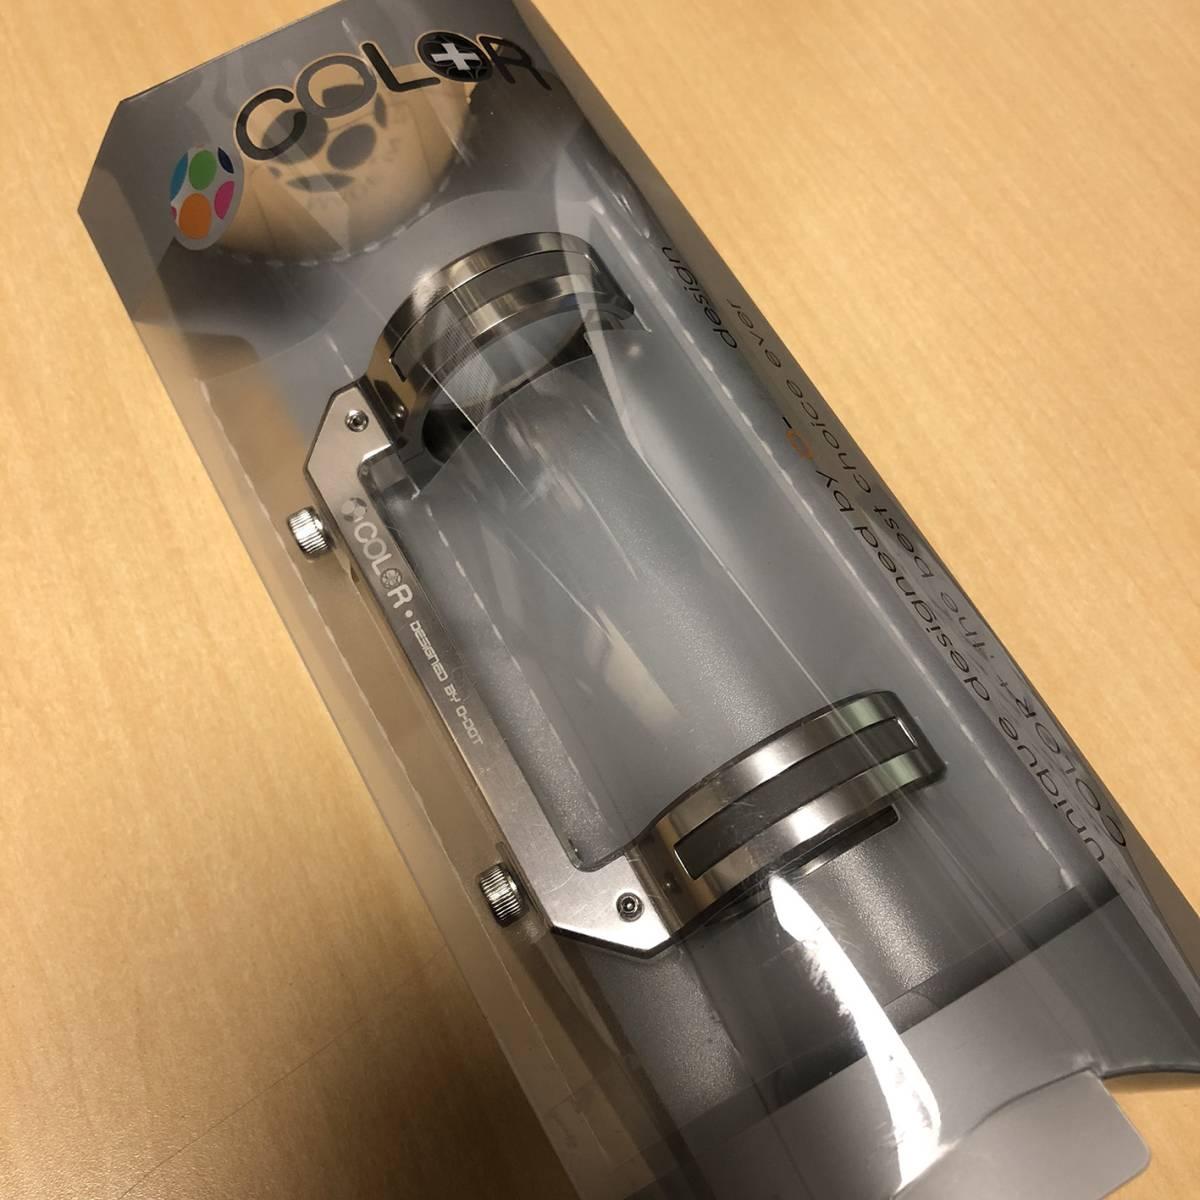 CollarPlus ボトルケージ台座 BHC01 シルバー / Birdy BD-1